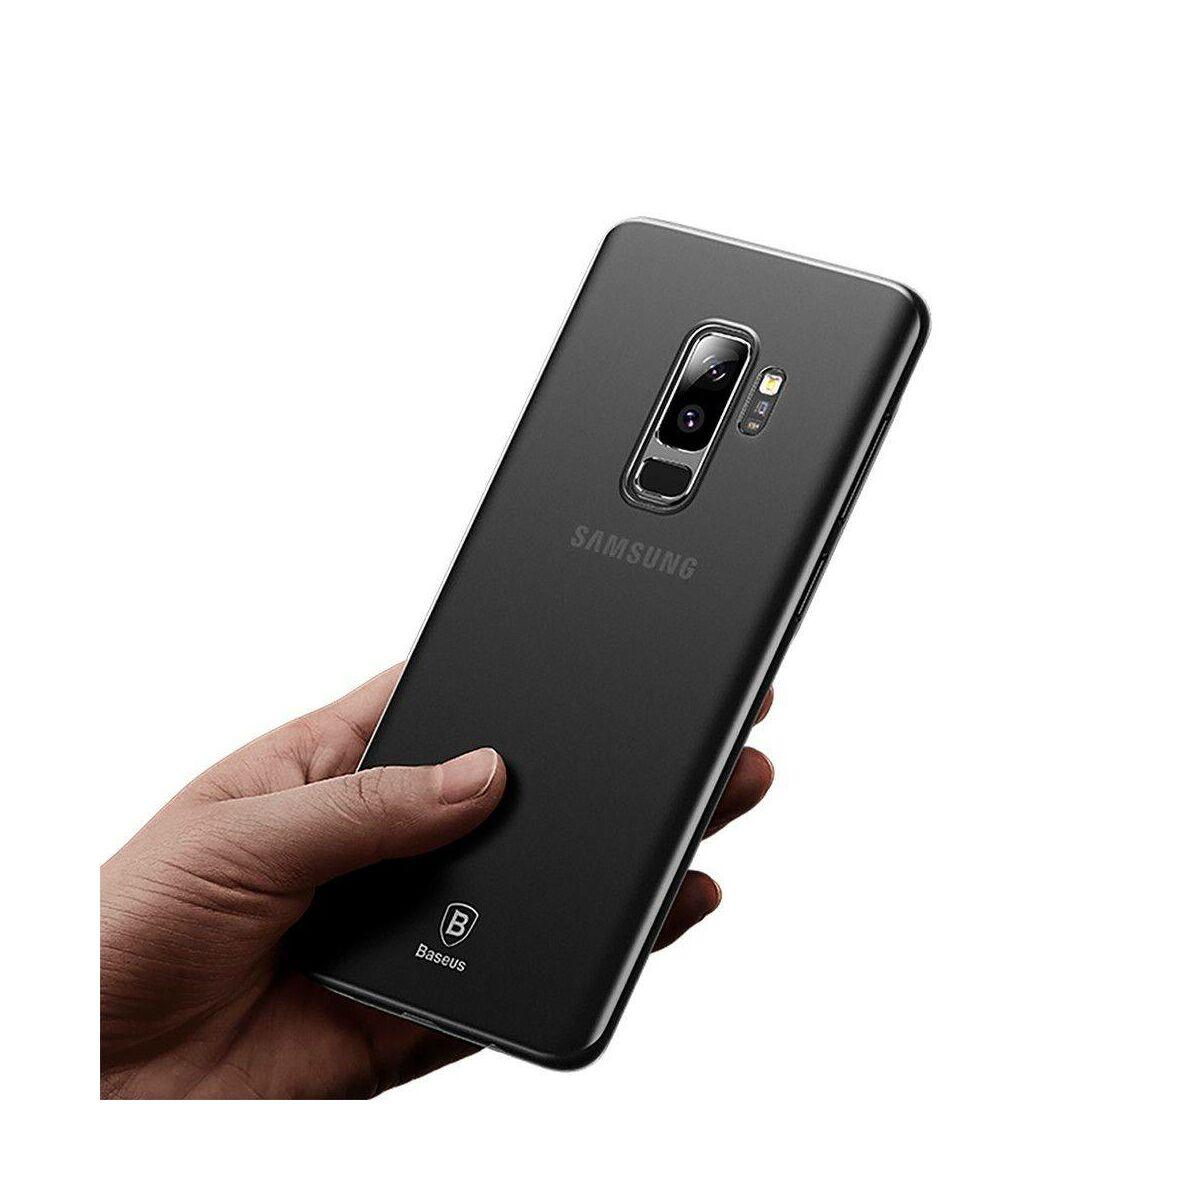 Baseus Samsung S9 Plus tok, Wing, átlátszó, fekete (WISAS9P-01)